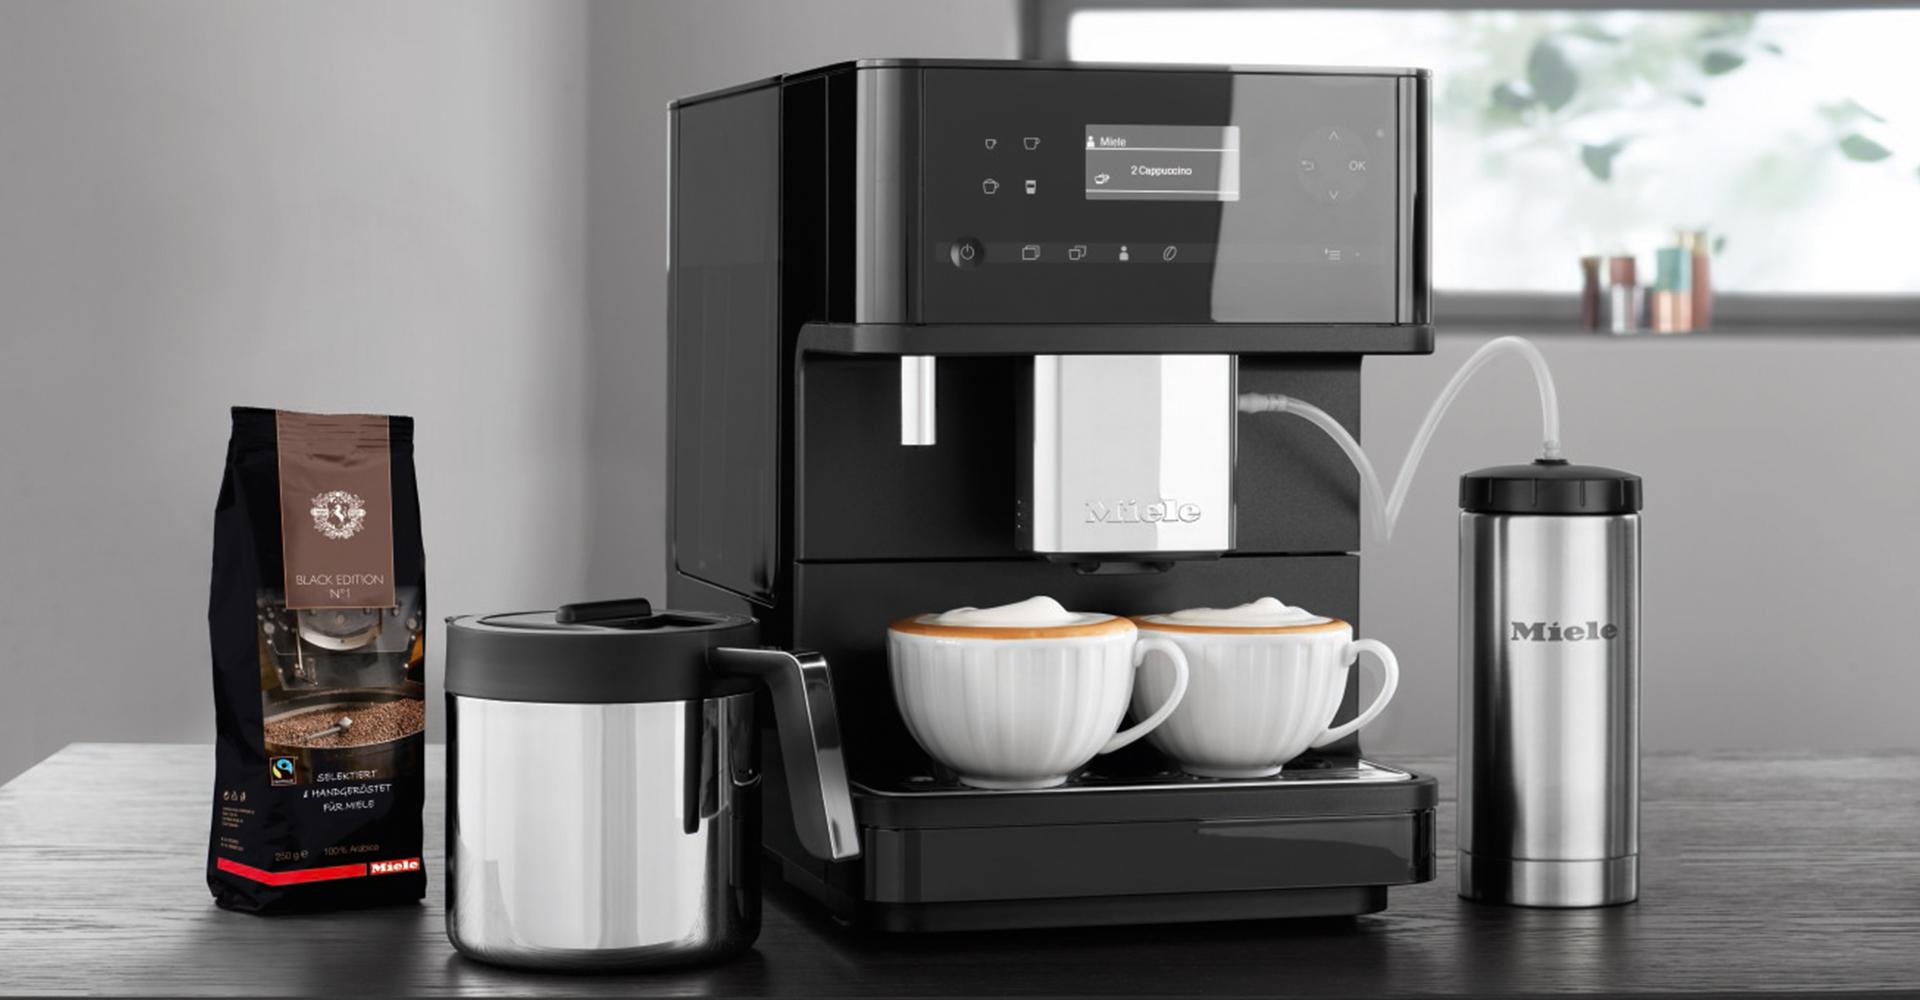 miele cm6 kaffeevollautomat miele. Black Bedroom Furniture Sets. Home Design Ideas